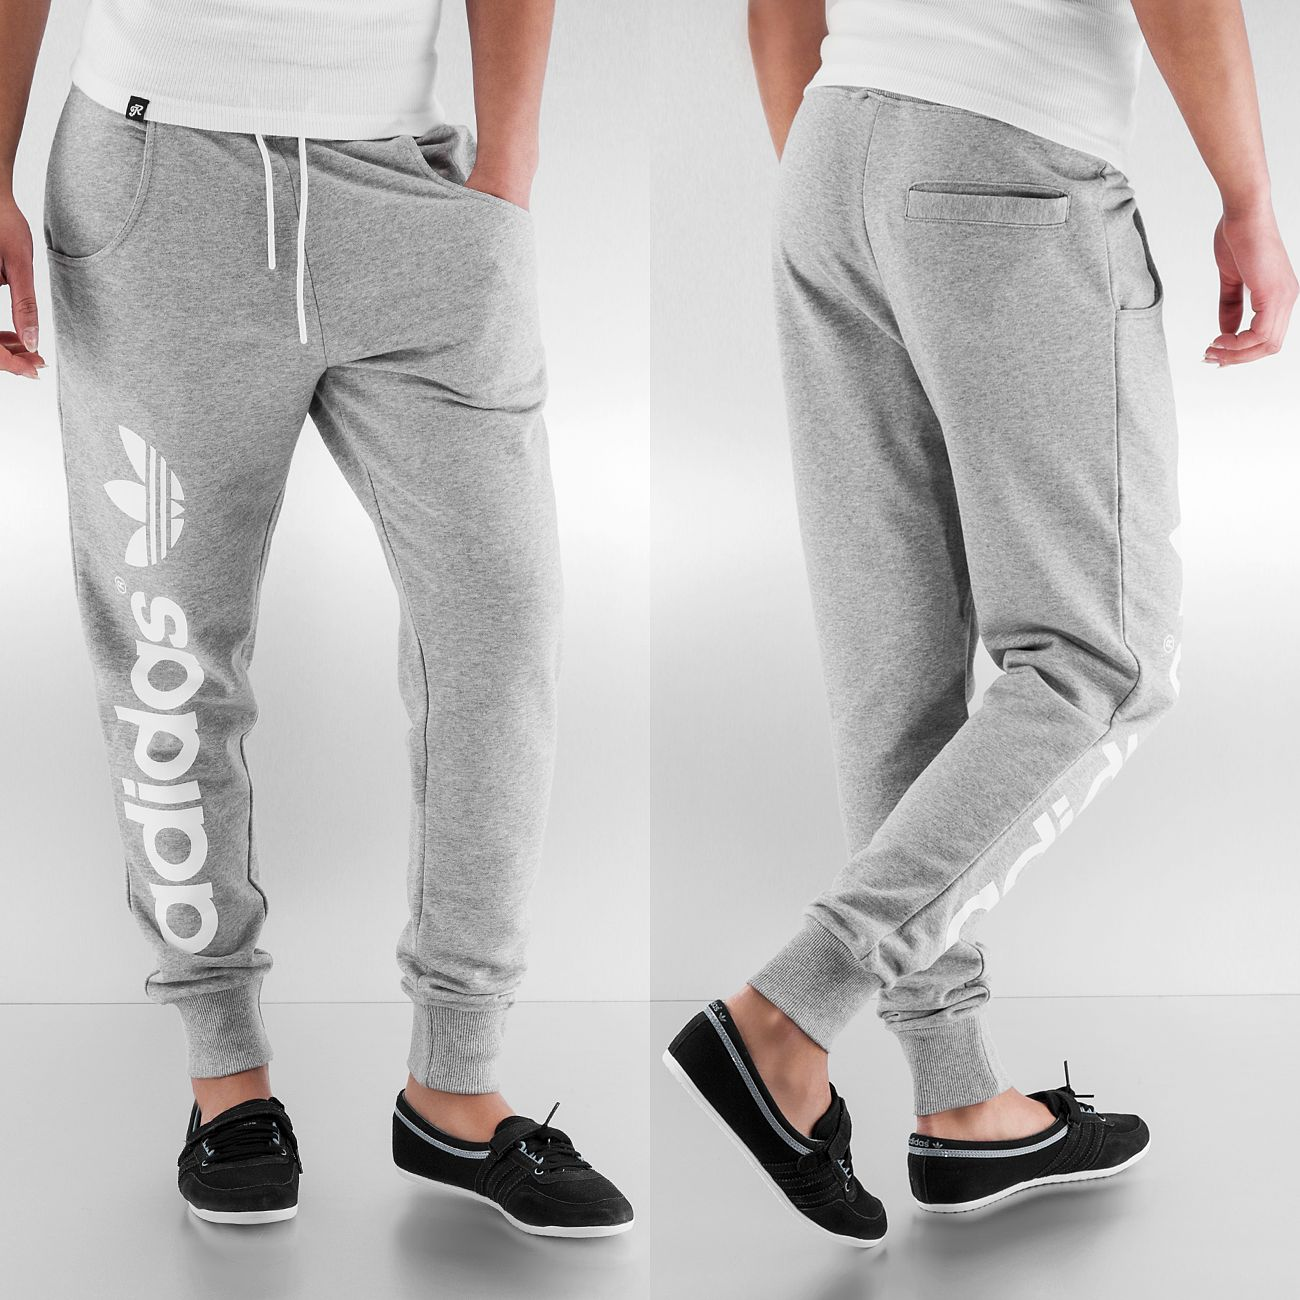 Adidas Pantalon / Jogging Baggy Track Pants en gris